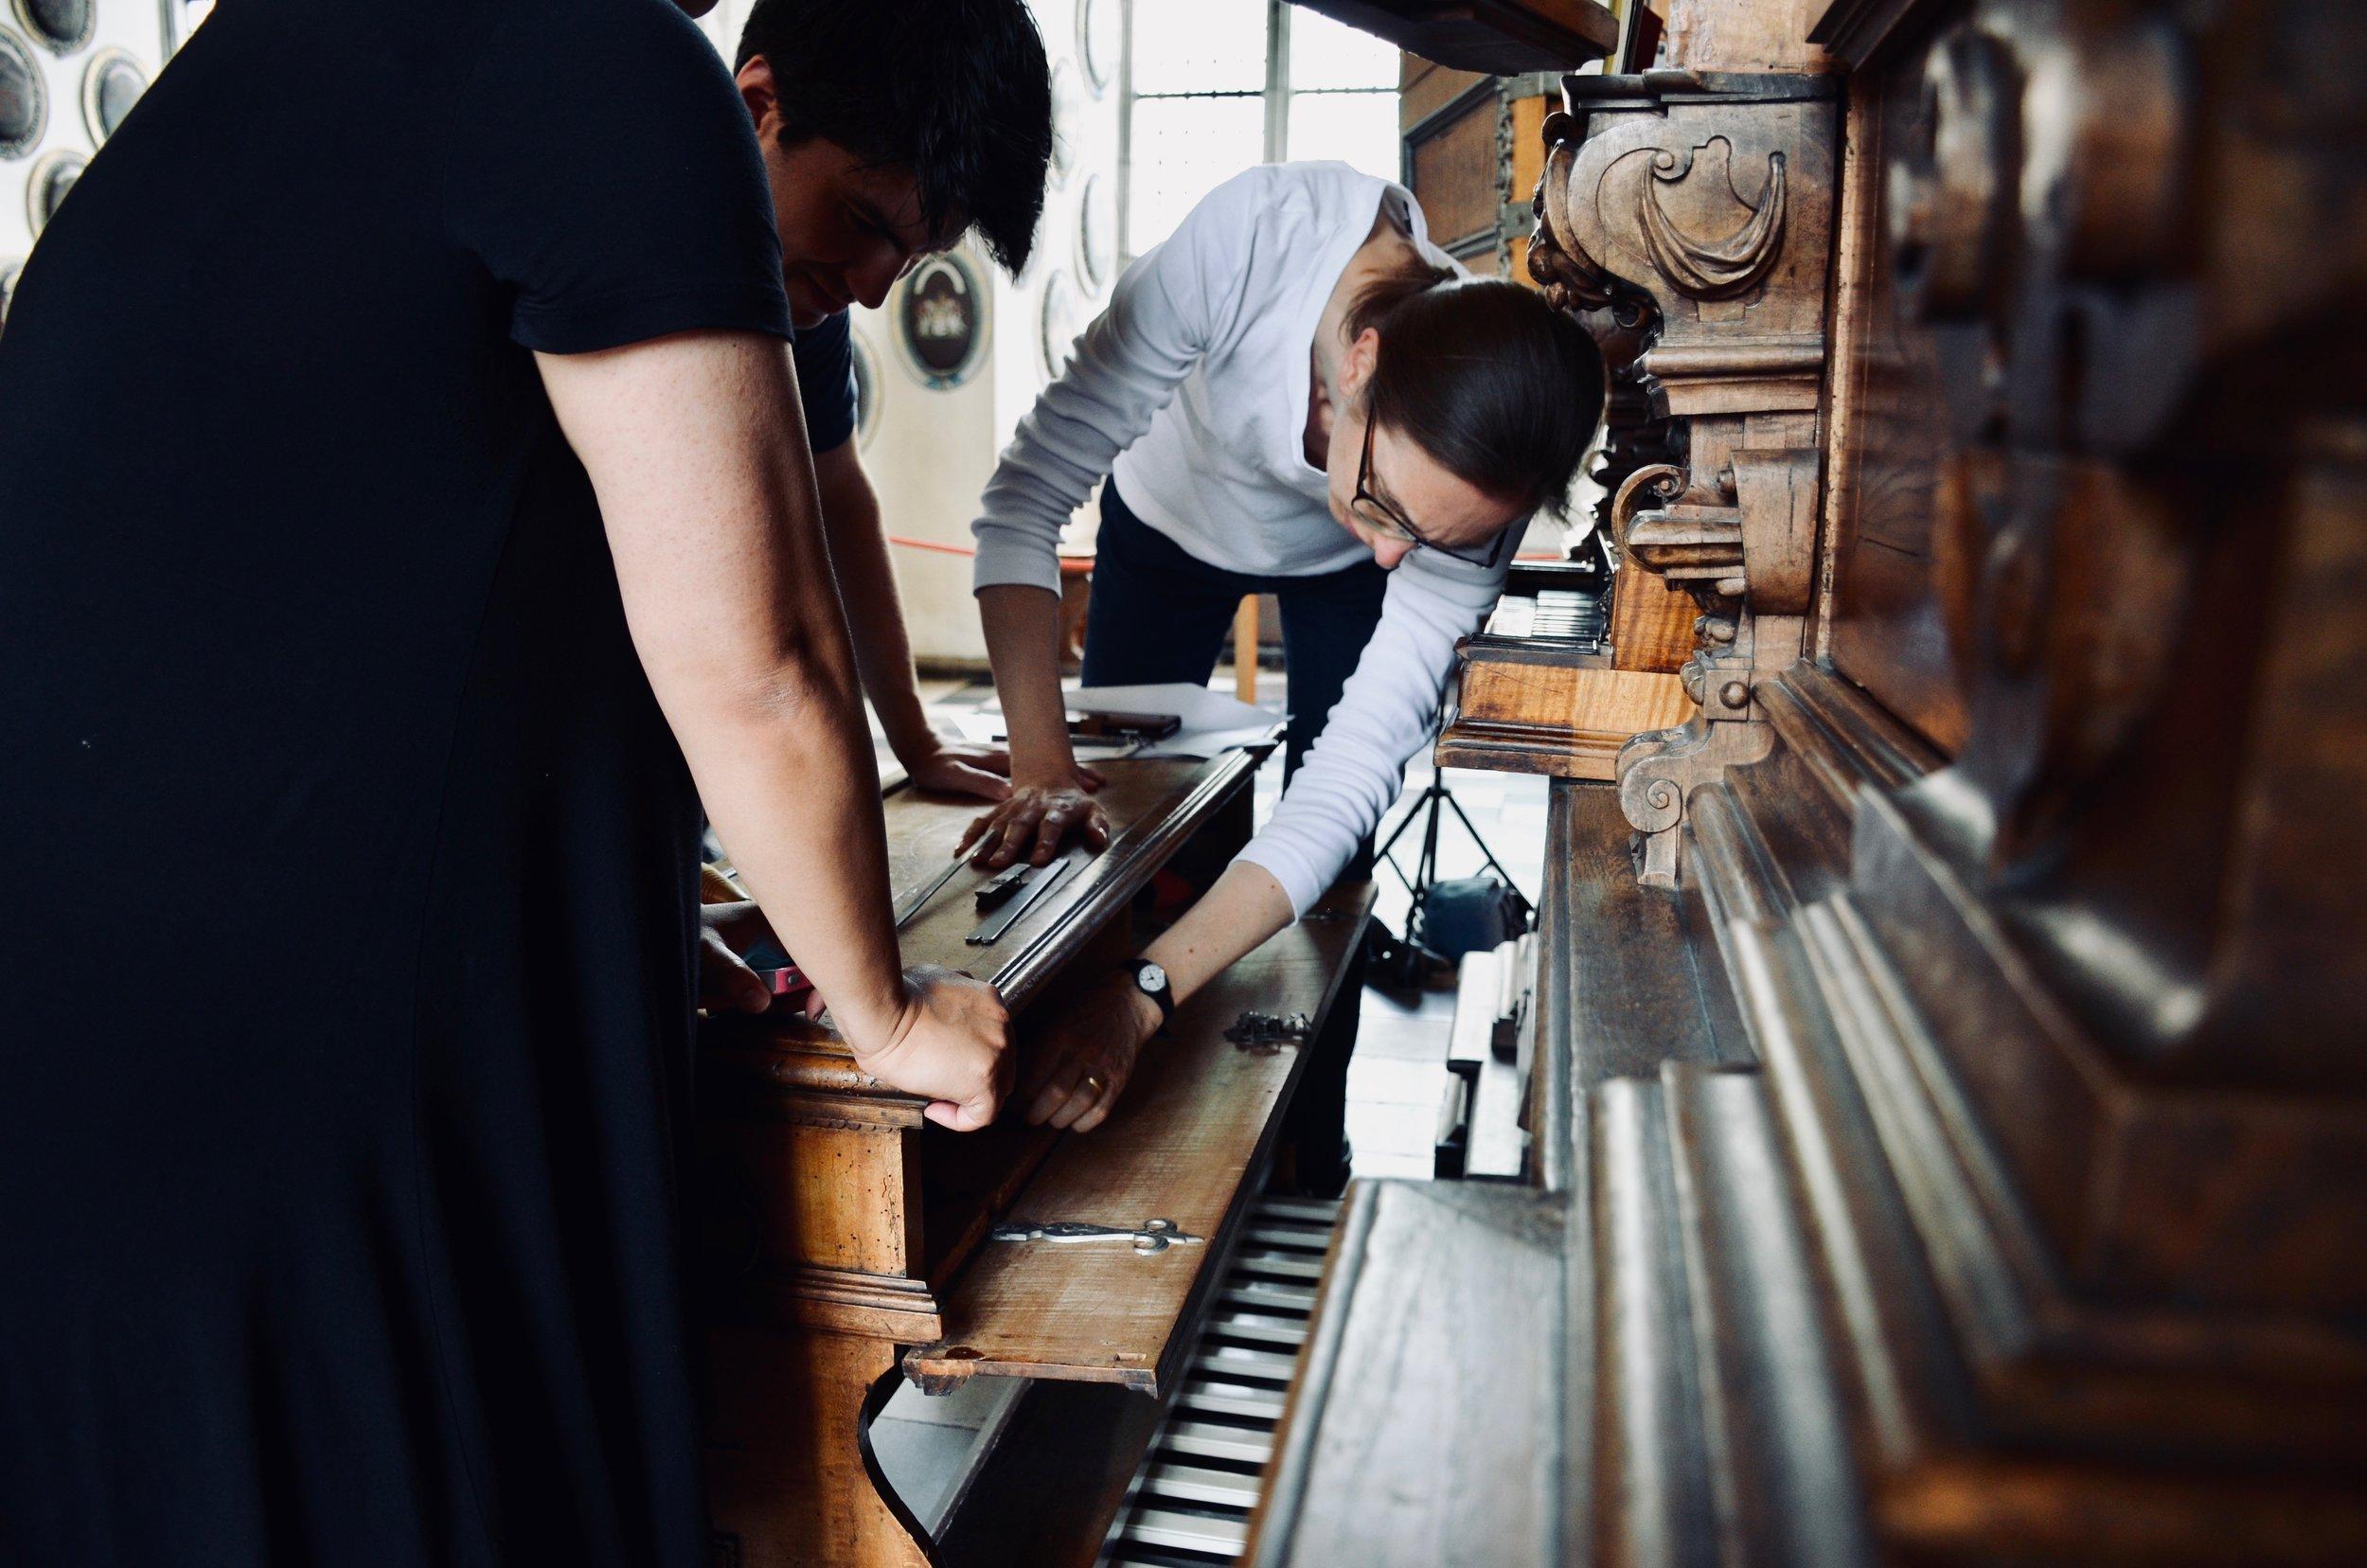 Castle organist Bine Bryndorf opens the bench compartment, 1610 Compenius organ, Frederiksborg Castle, Hillerød, Denmark.